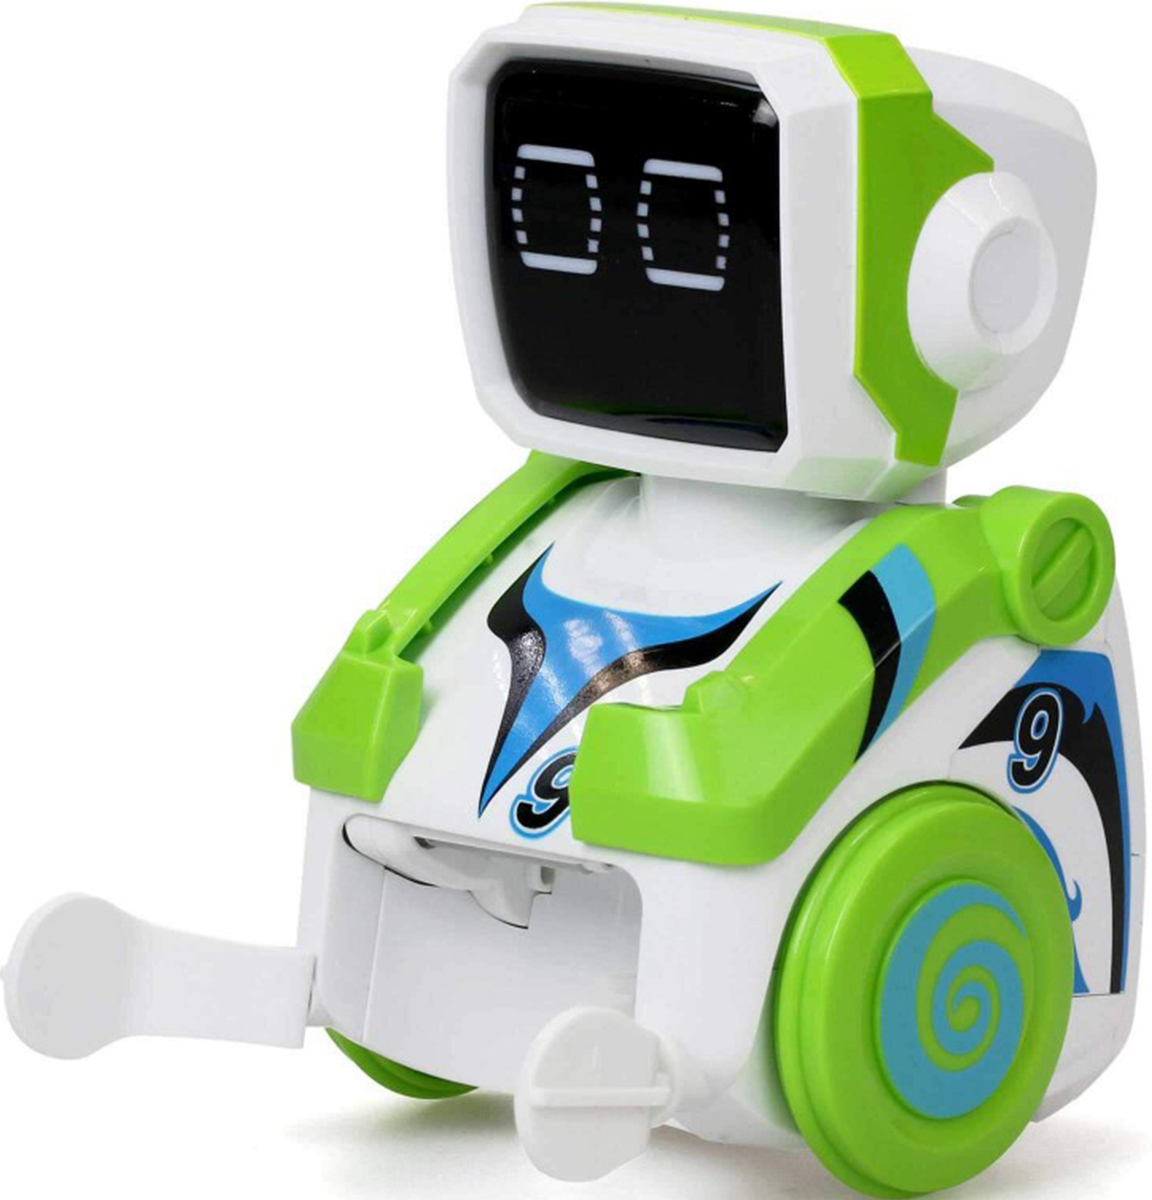 Silverlit Old School Робот футболист Кикабот цвет зеленый clippasafe clippasafe ворота безопасности металлические